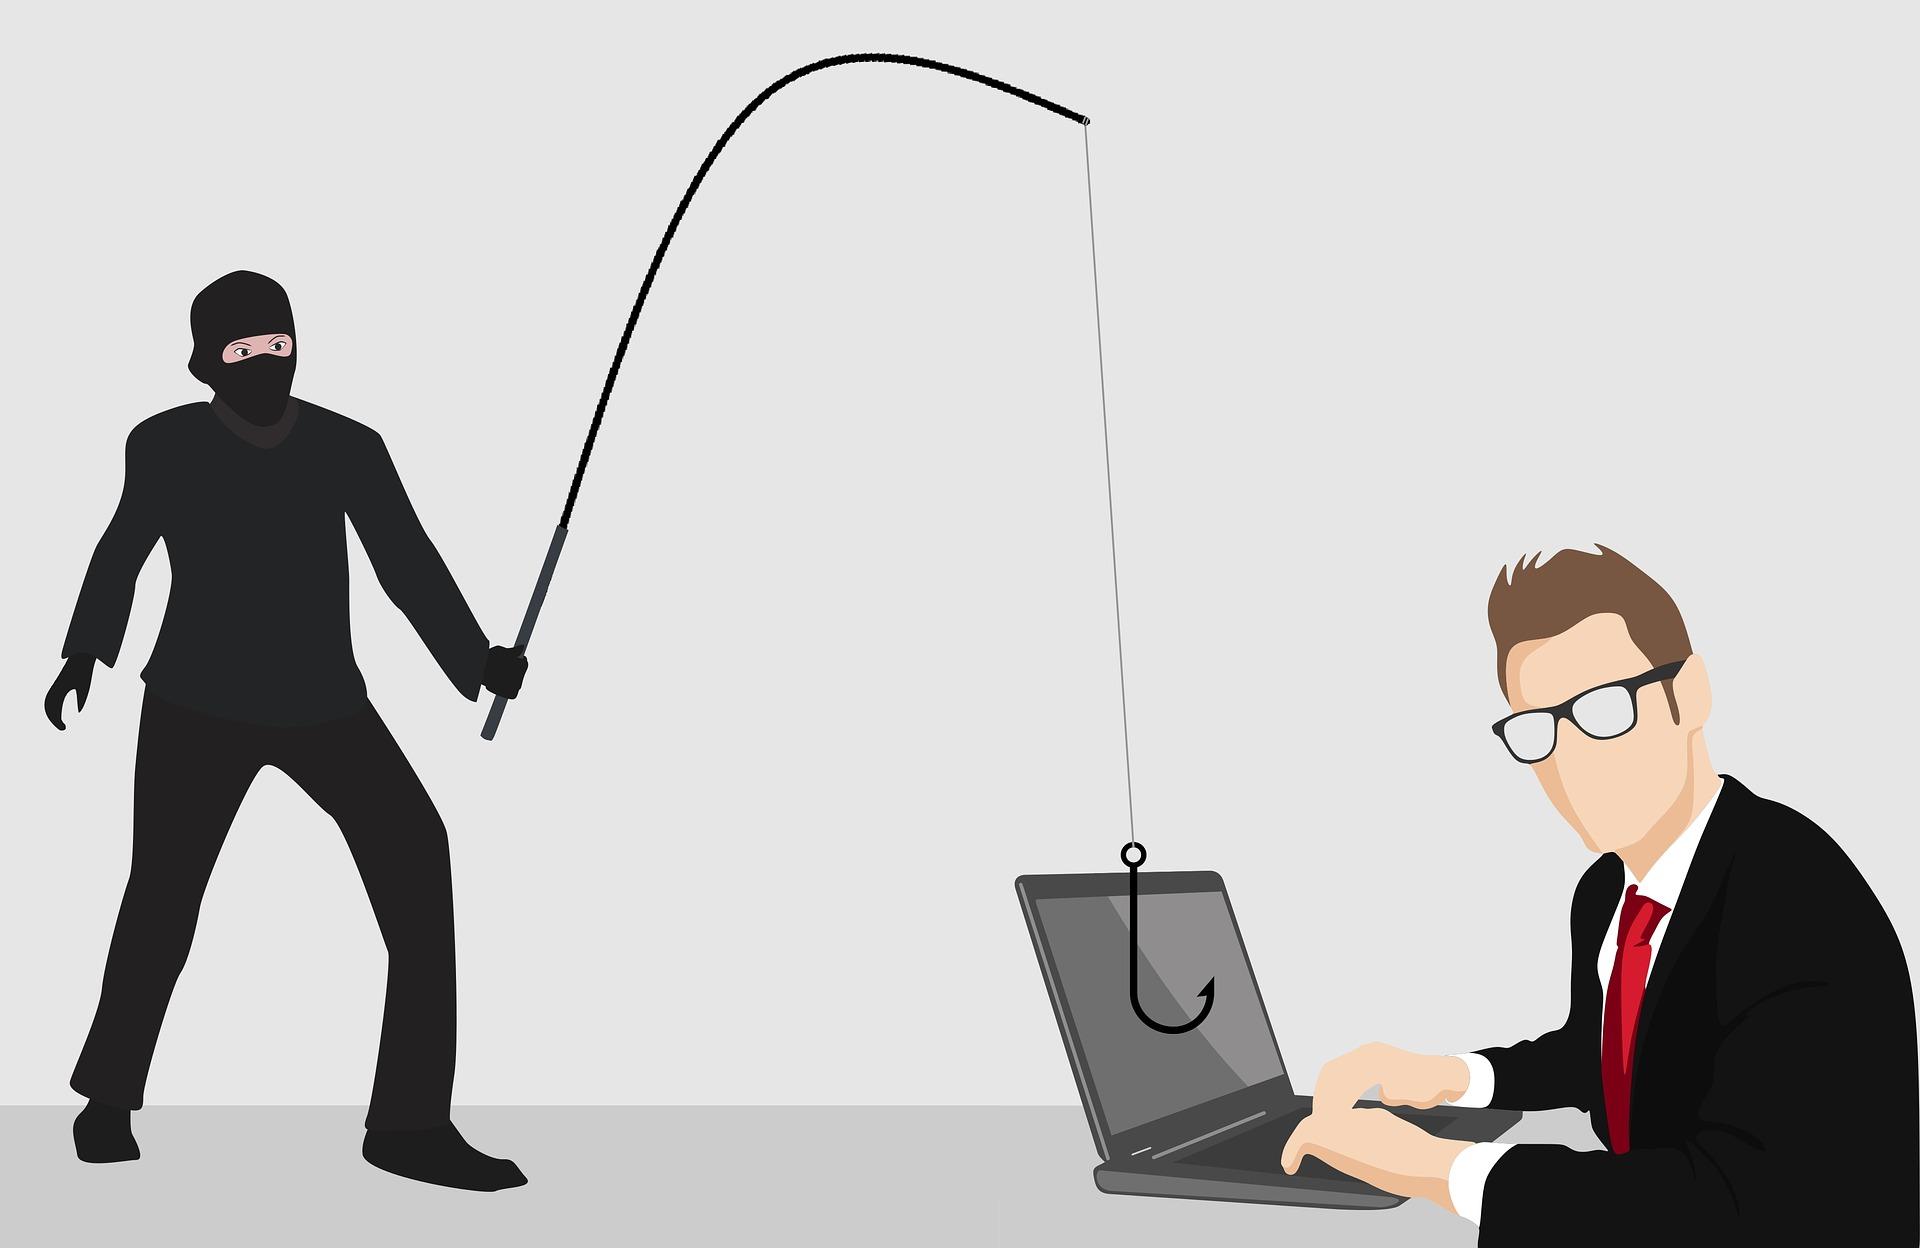 Phishing Scam - Your Microsoft Account Expires Soon! Please Update Now